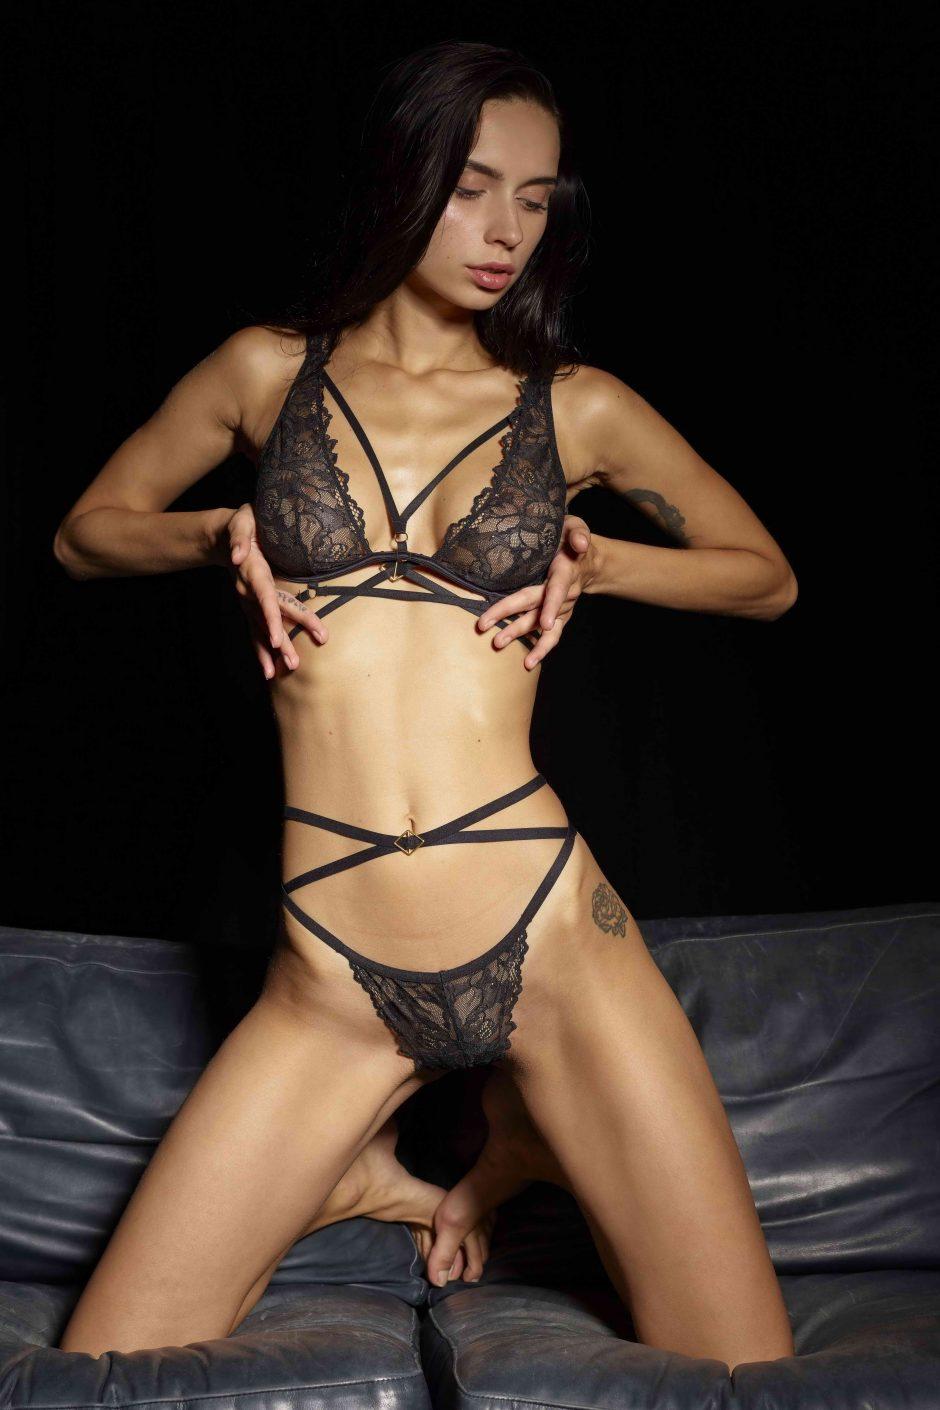 Zara Very Fit Lady